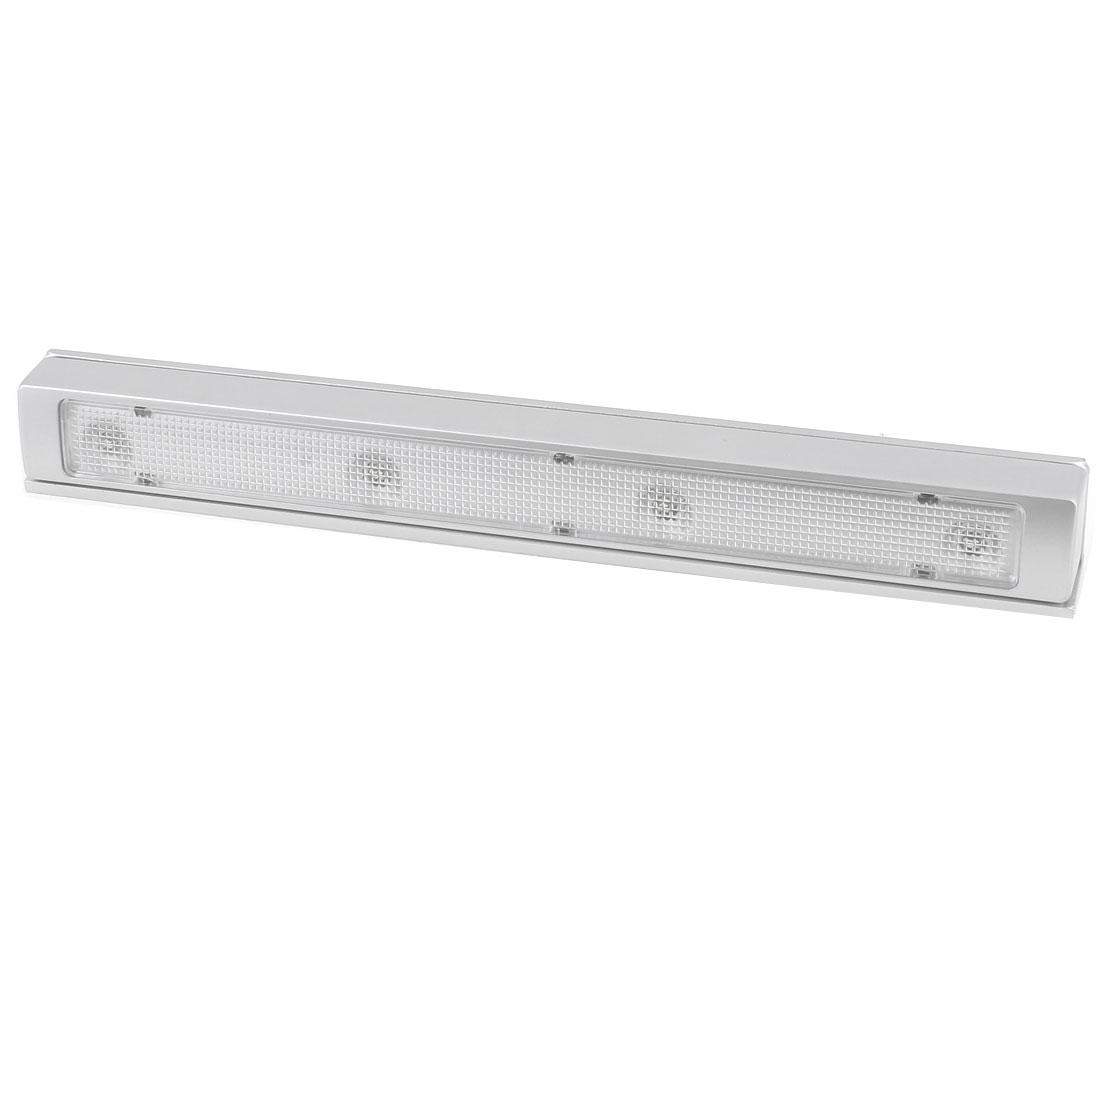 PIR Infrared Wireless Auto Shake Sensor 4 LED Vibration Light Lamp